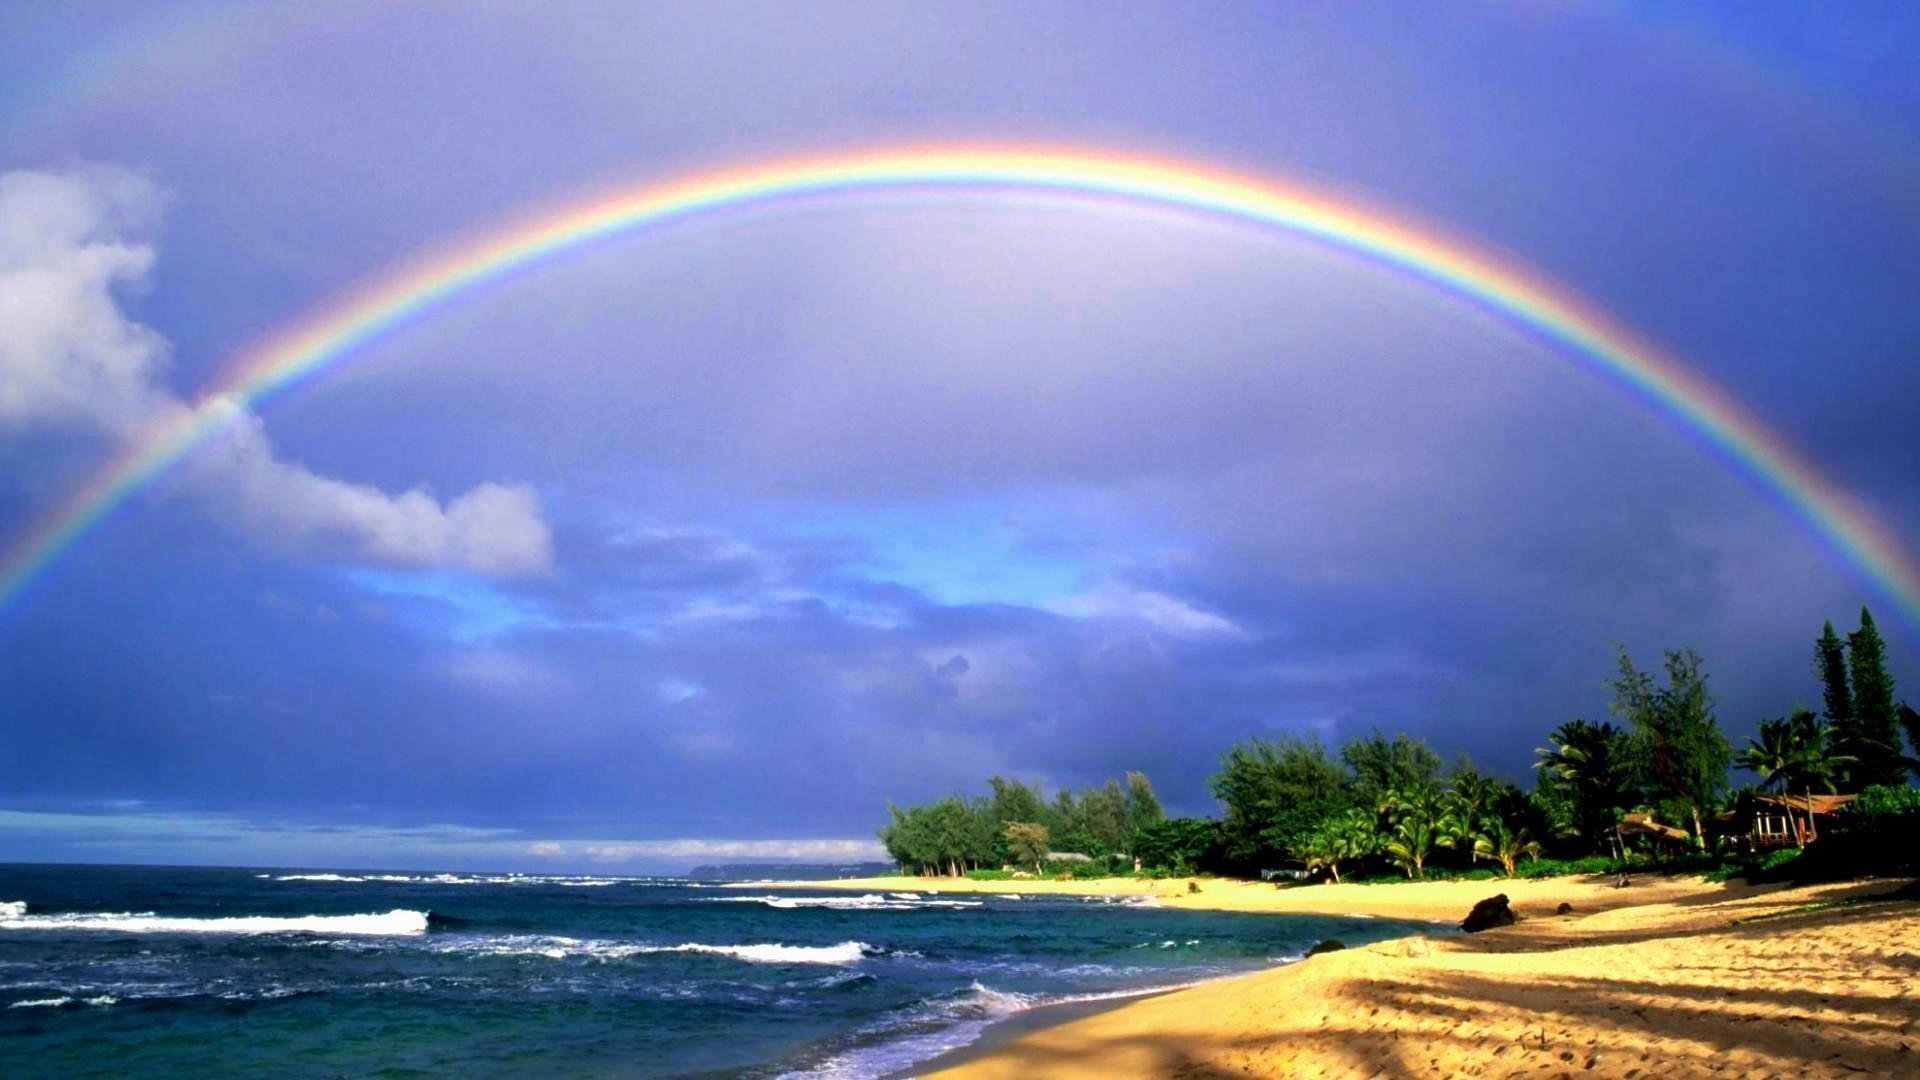 Rainbow-Hawaii-Beach-Wallpaper-HD-Free-Download